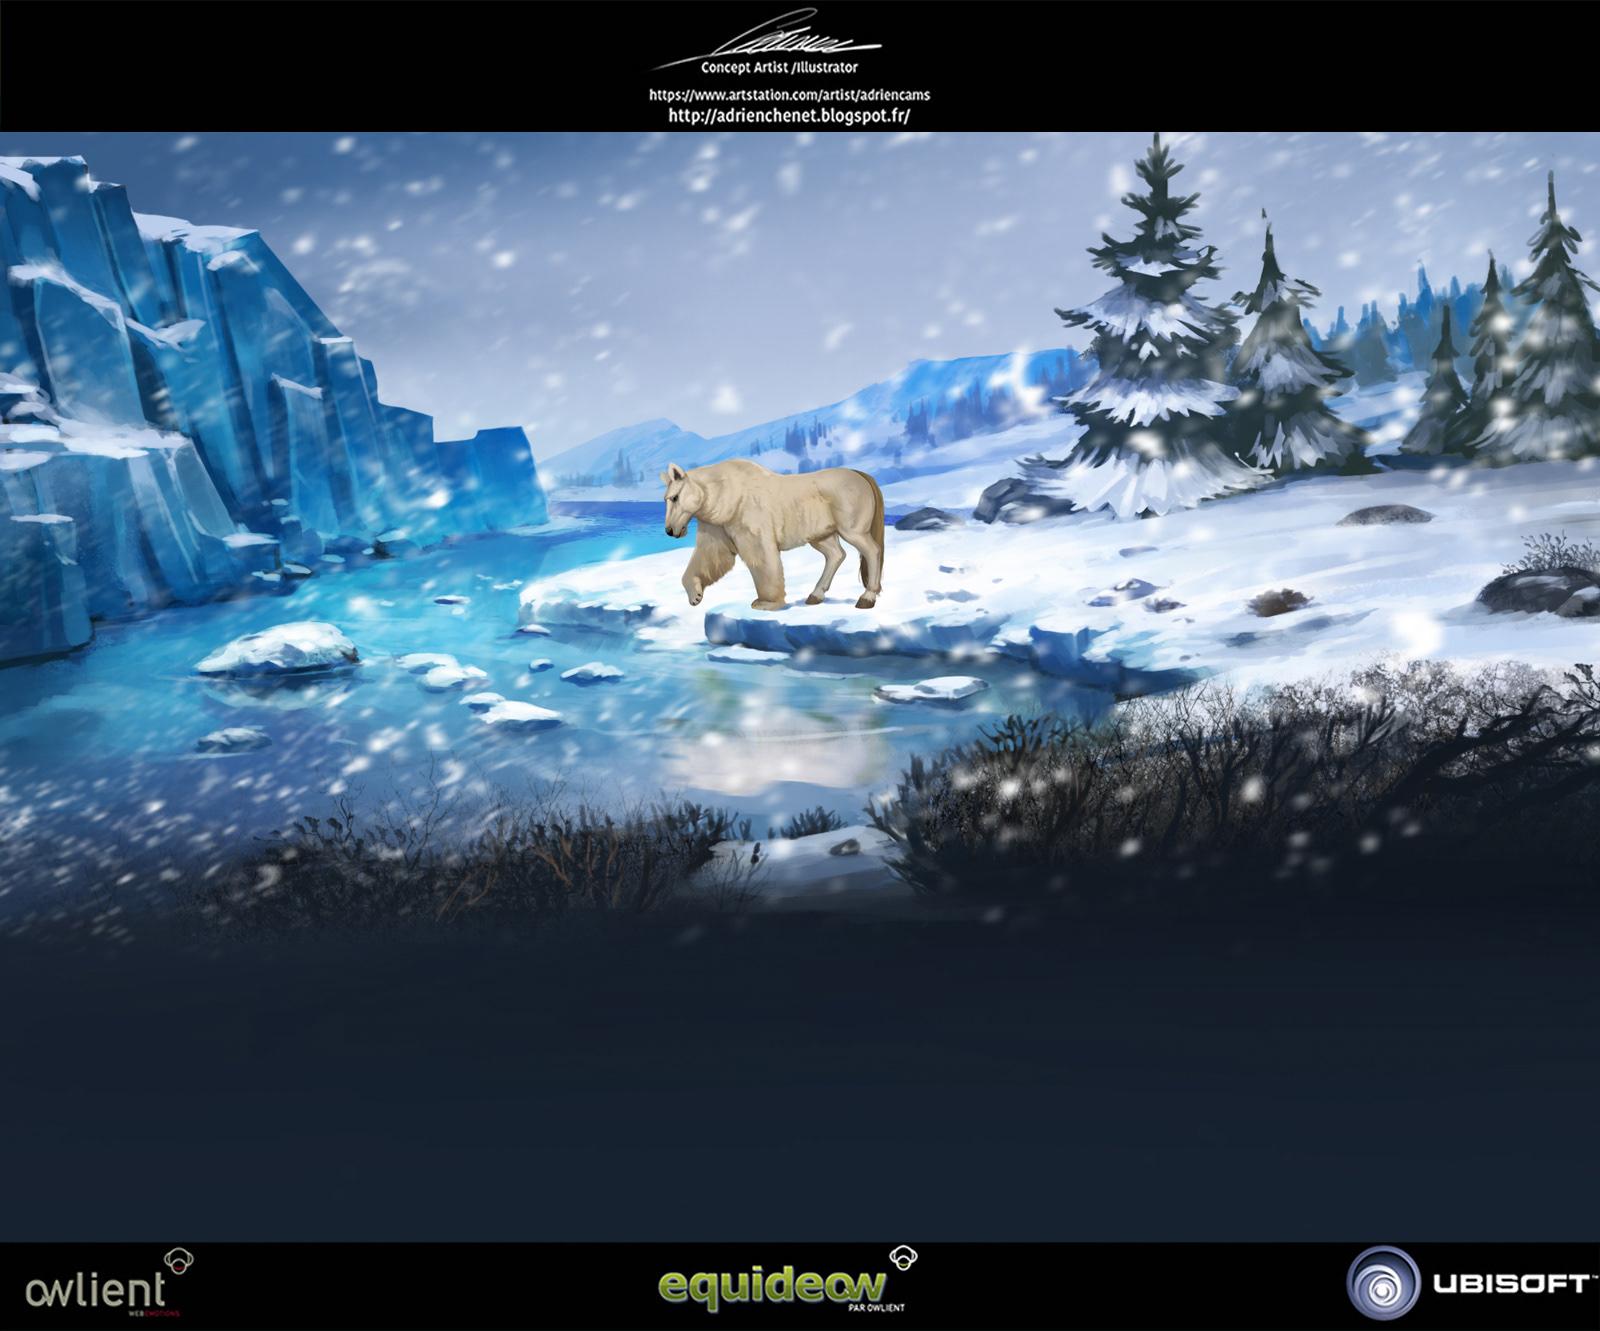 Adrien Chenet - Owlient / Ubisoft projects